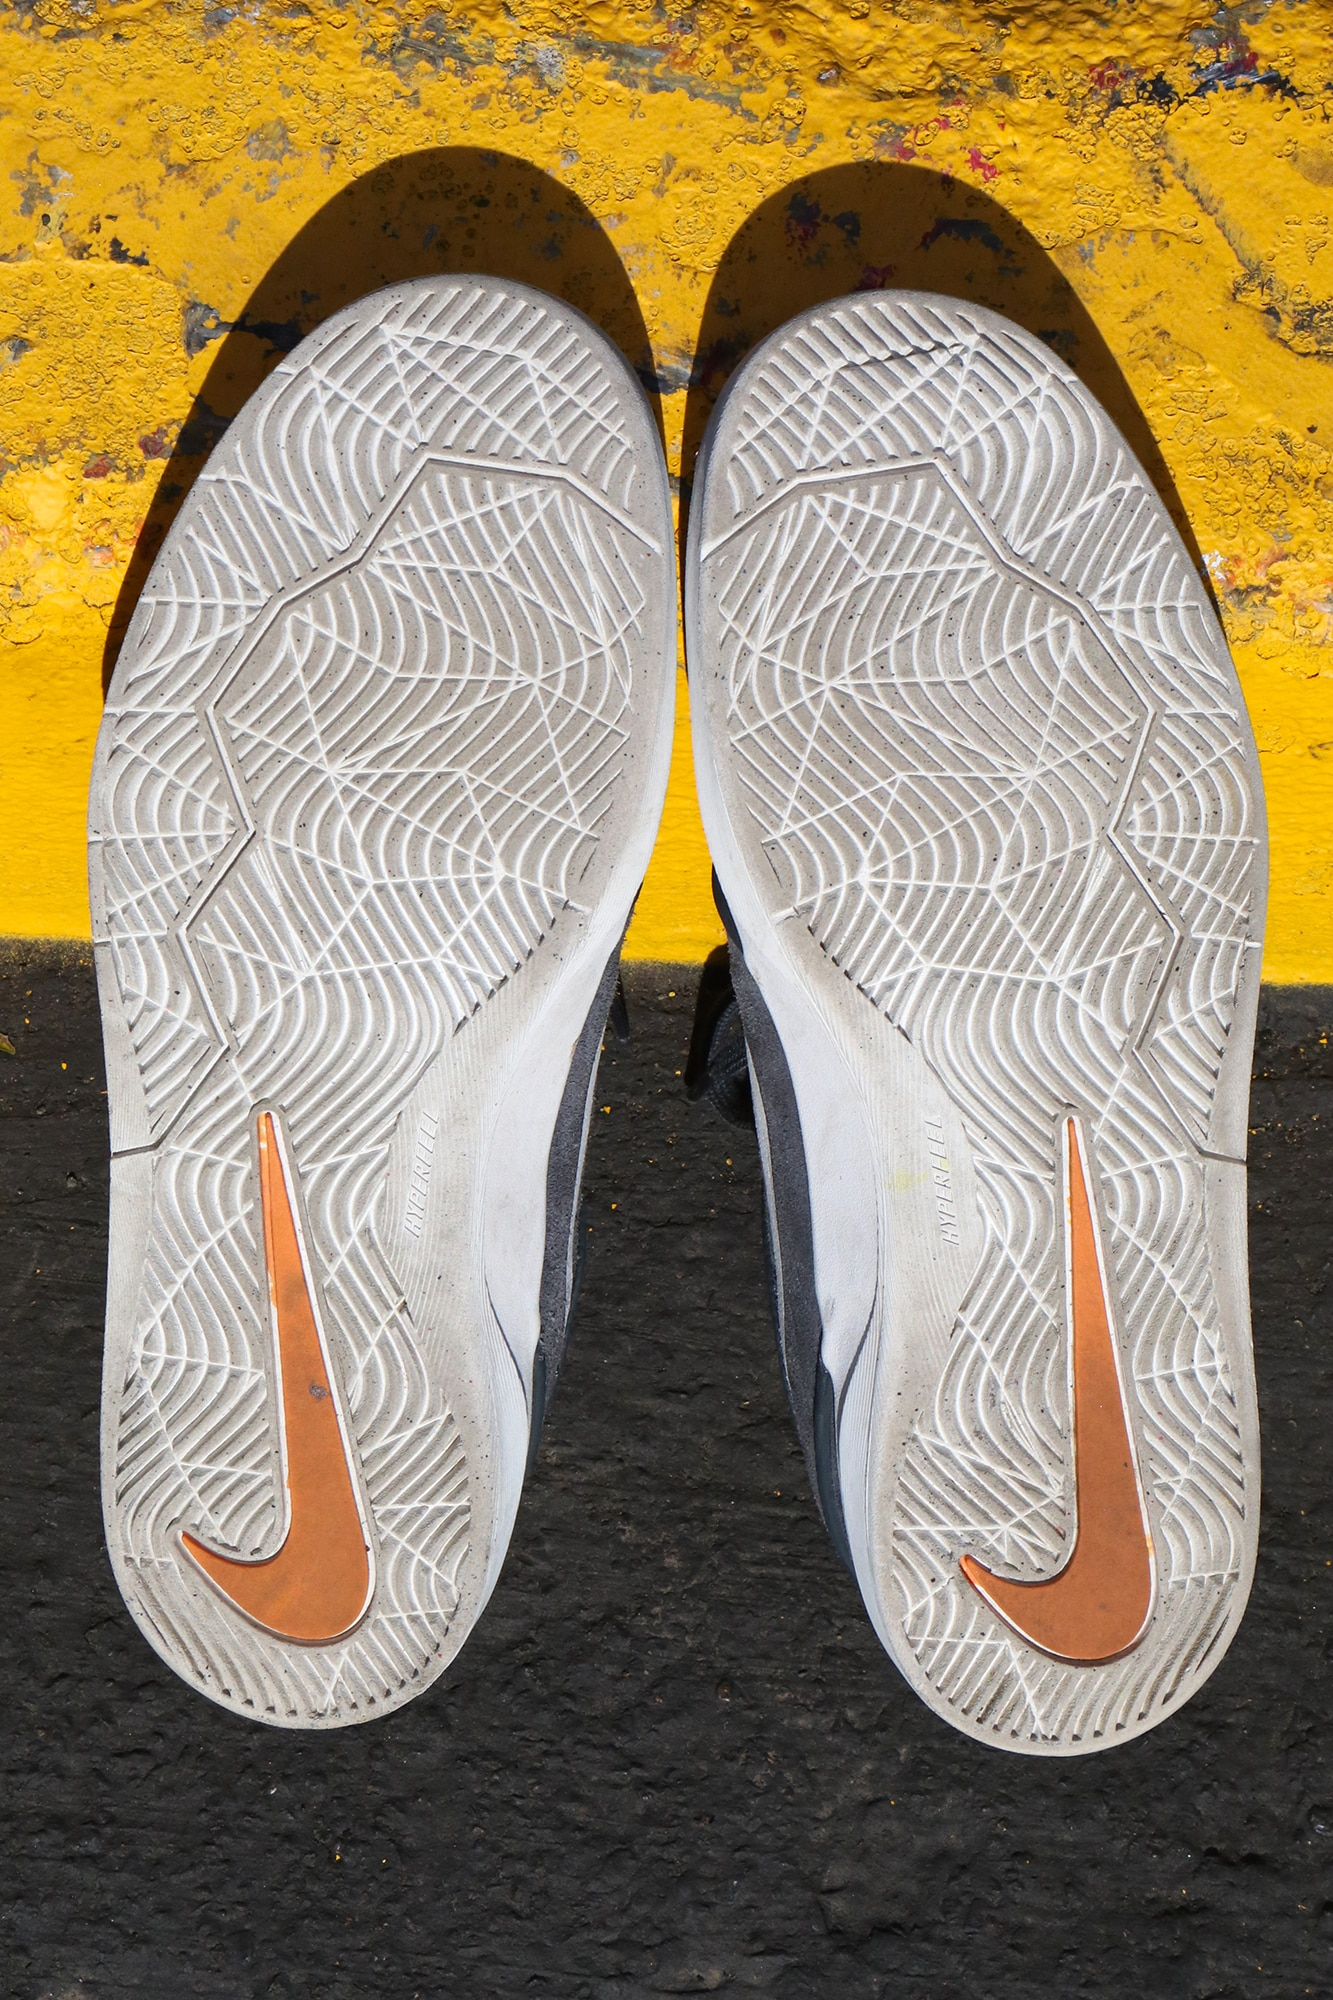 Plantación Australia Montañas climáticas  Nike SB Janoski Hyperfeel XT Skate Shoes Wear Test Review | Tactics